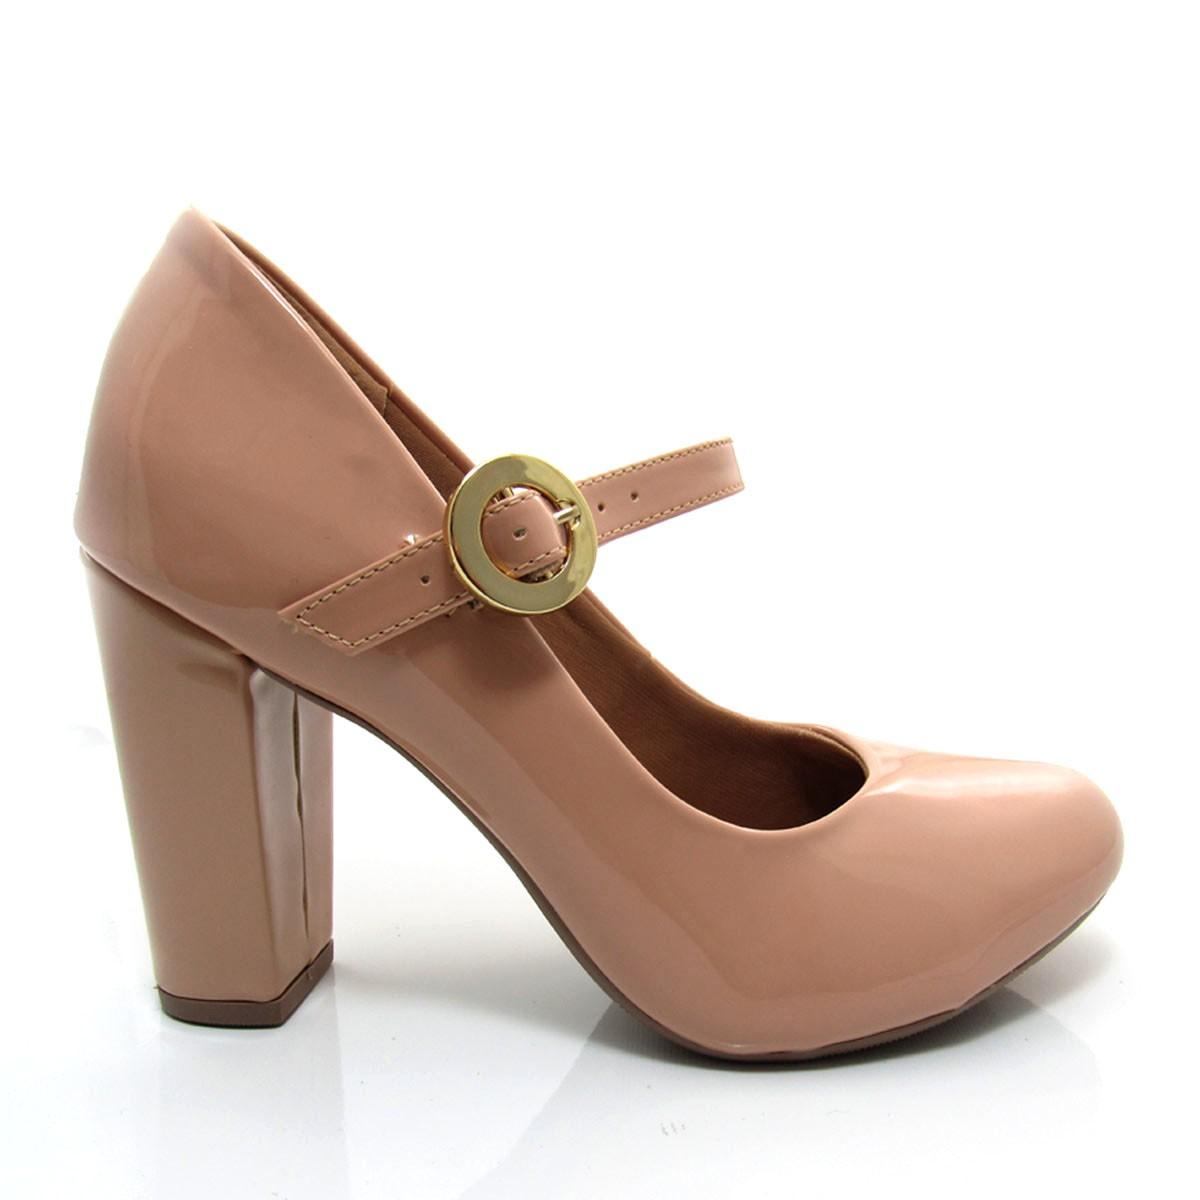 7aded6e84 Sapato Feminino Scarpin Boneca Salto Alto Mariotta Bico Redondo